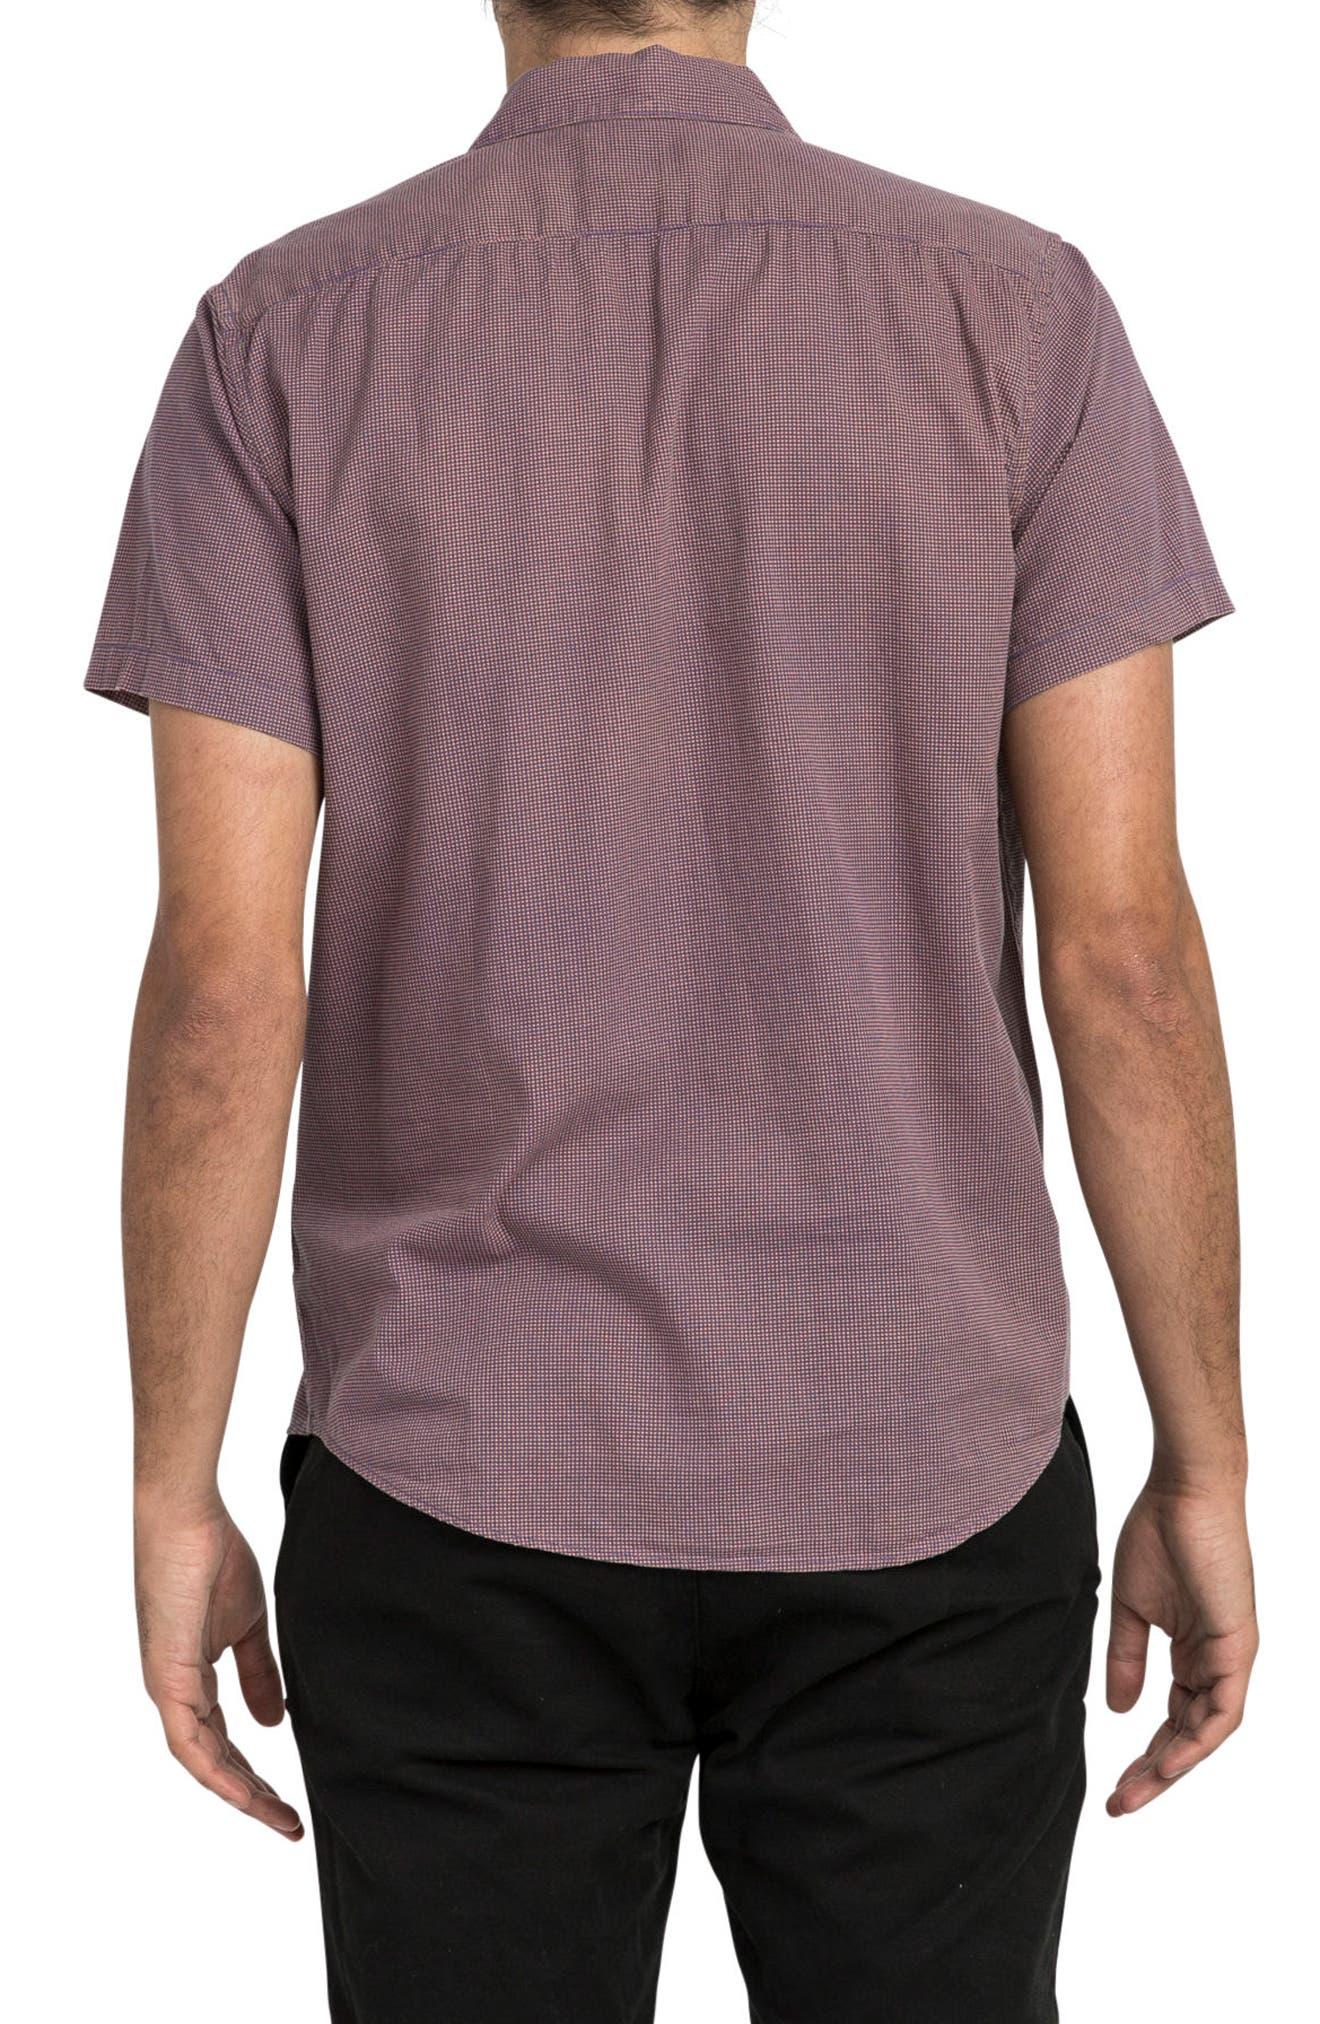 No Name Woven Shirt,                             Alternate thumbnail 2, color,                             Terracotta